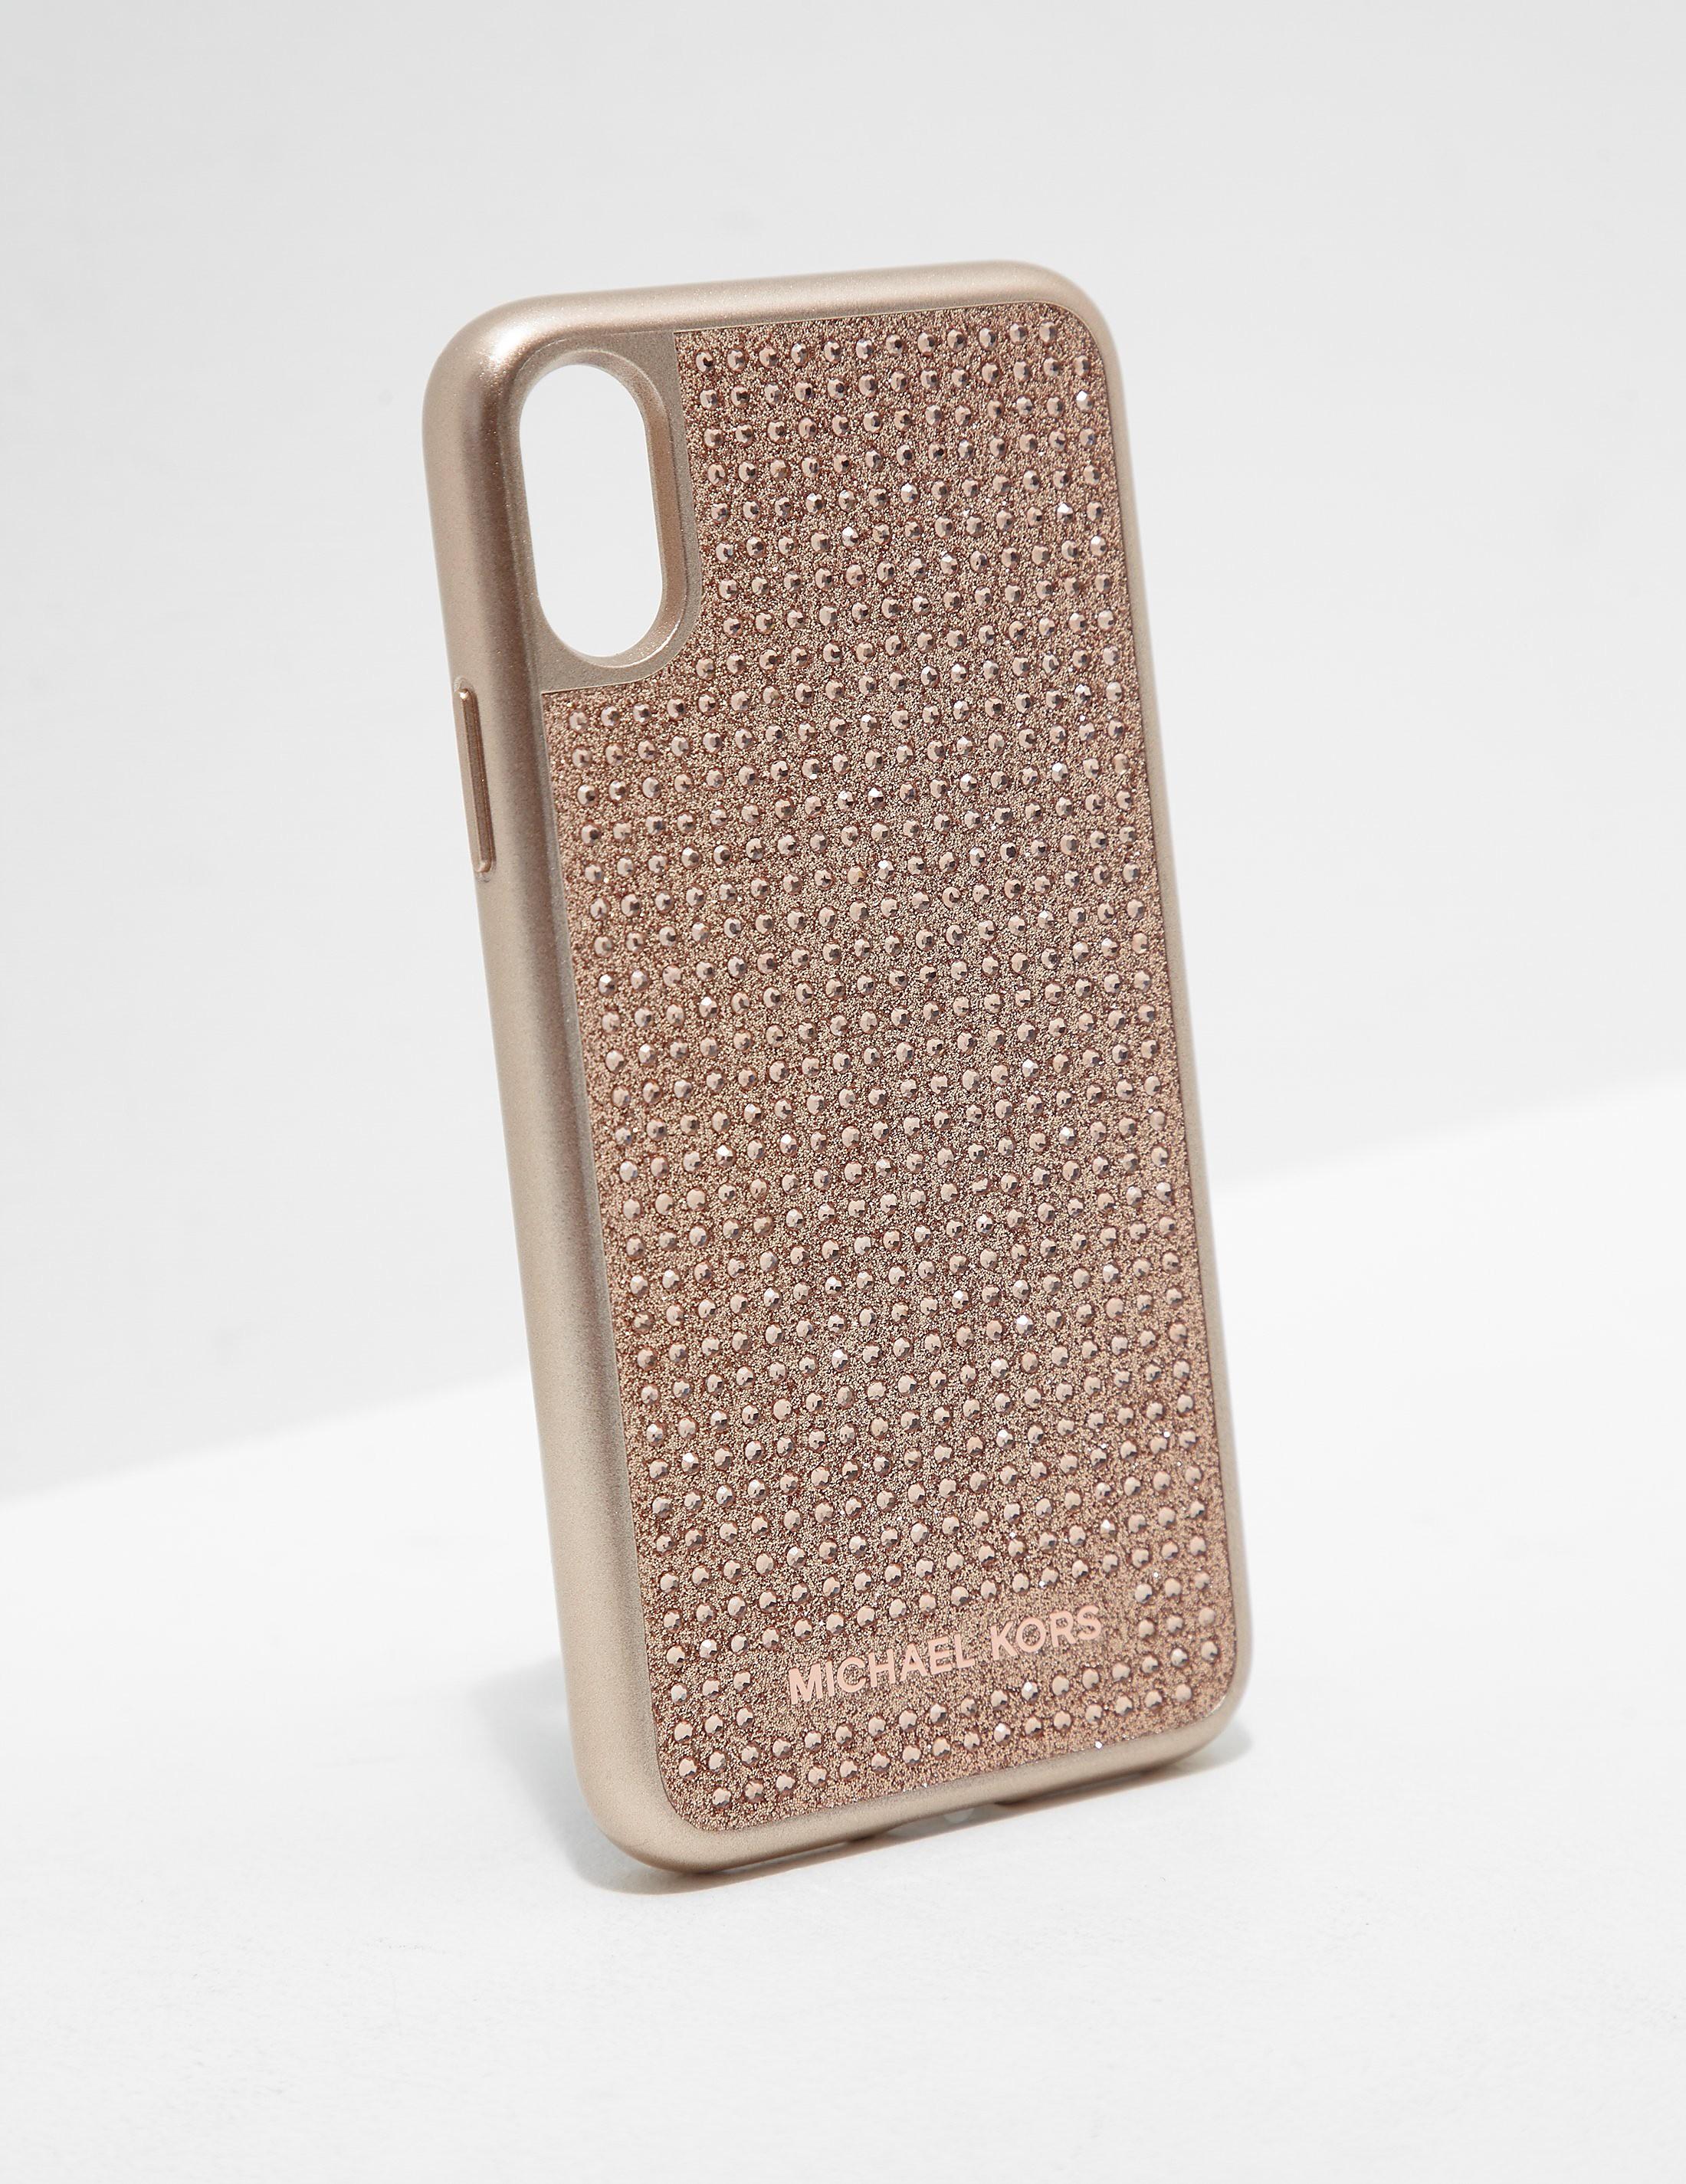 Michael Kors iPhone 8 Phone Cover